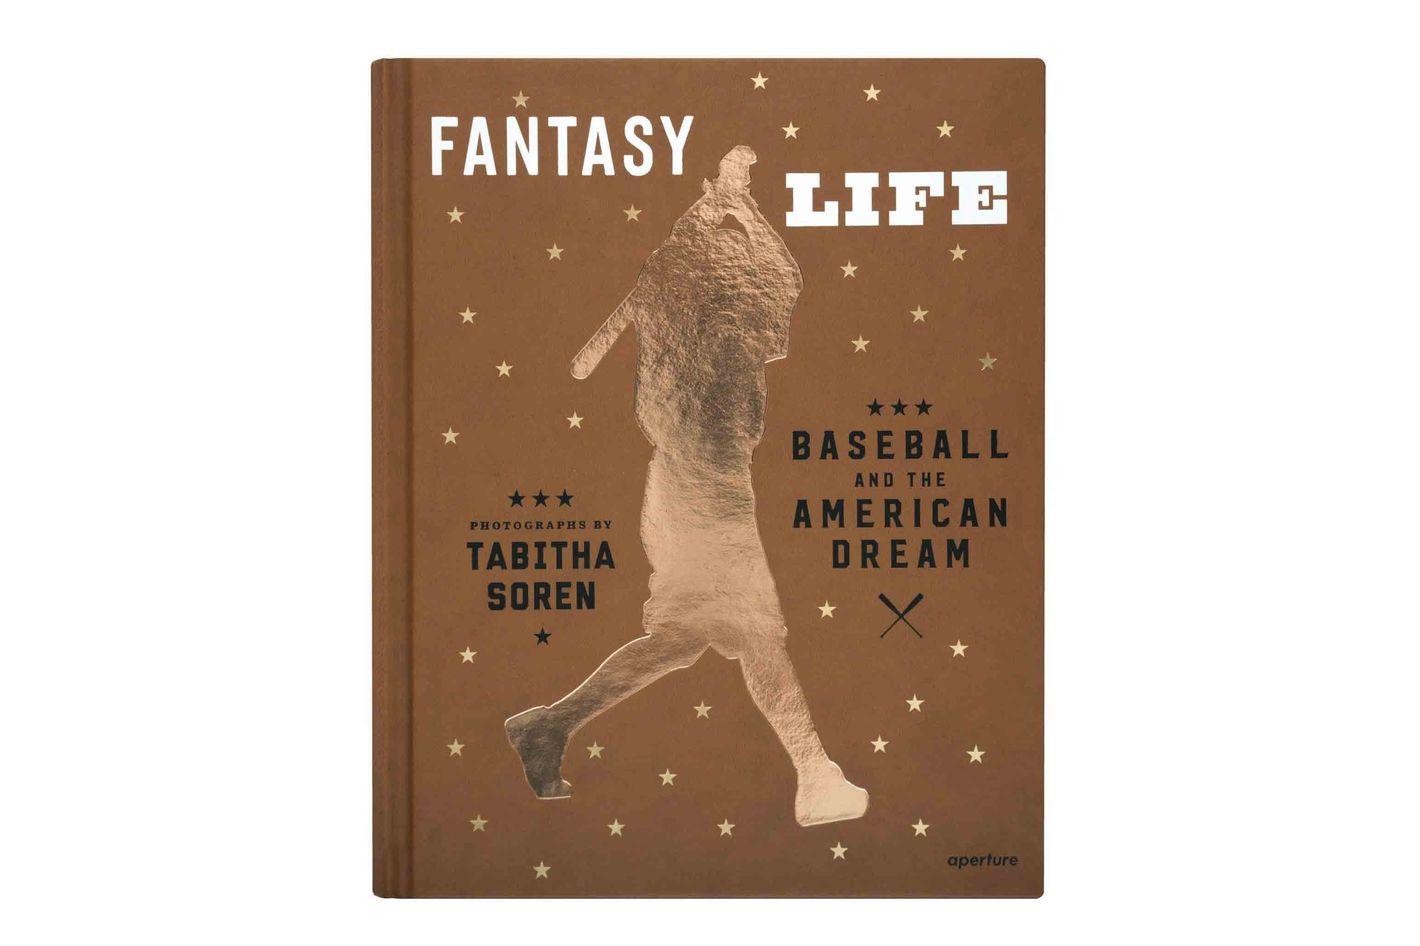 Fantasy Life: Baseball and the American Dream by Tabitha Soren